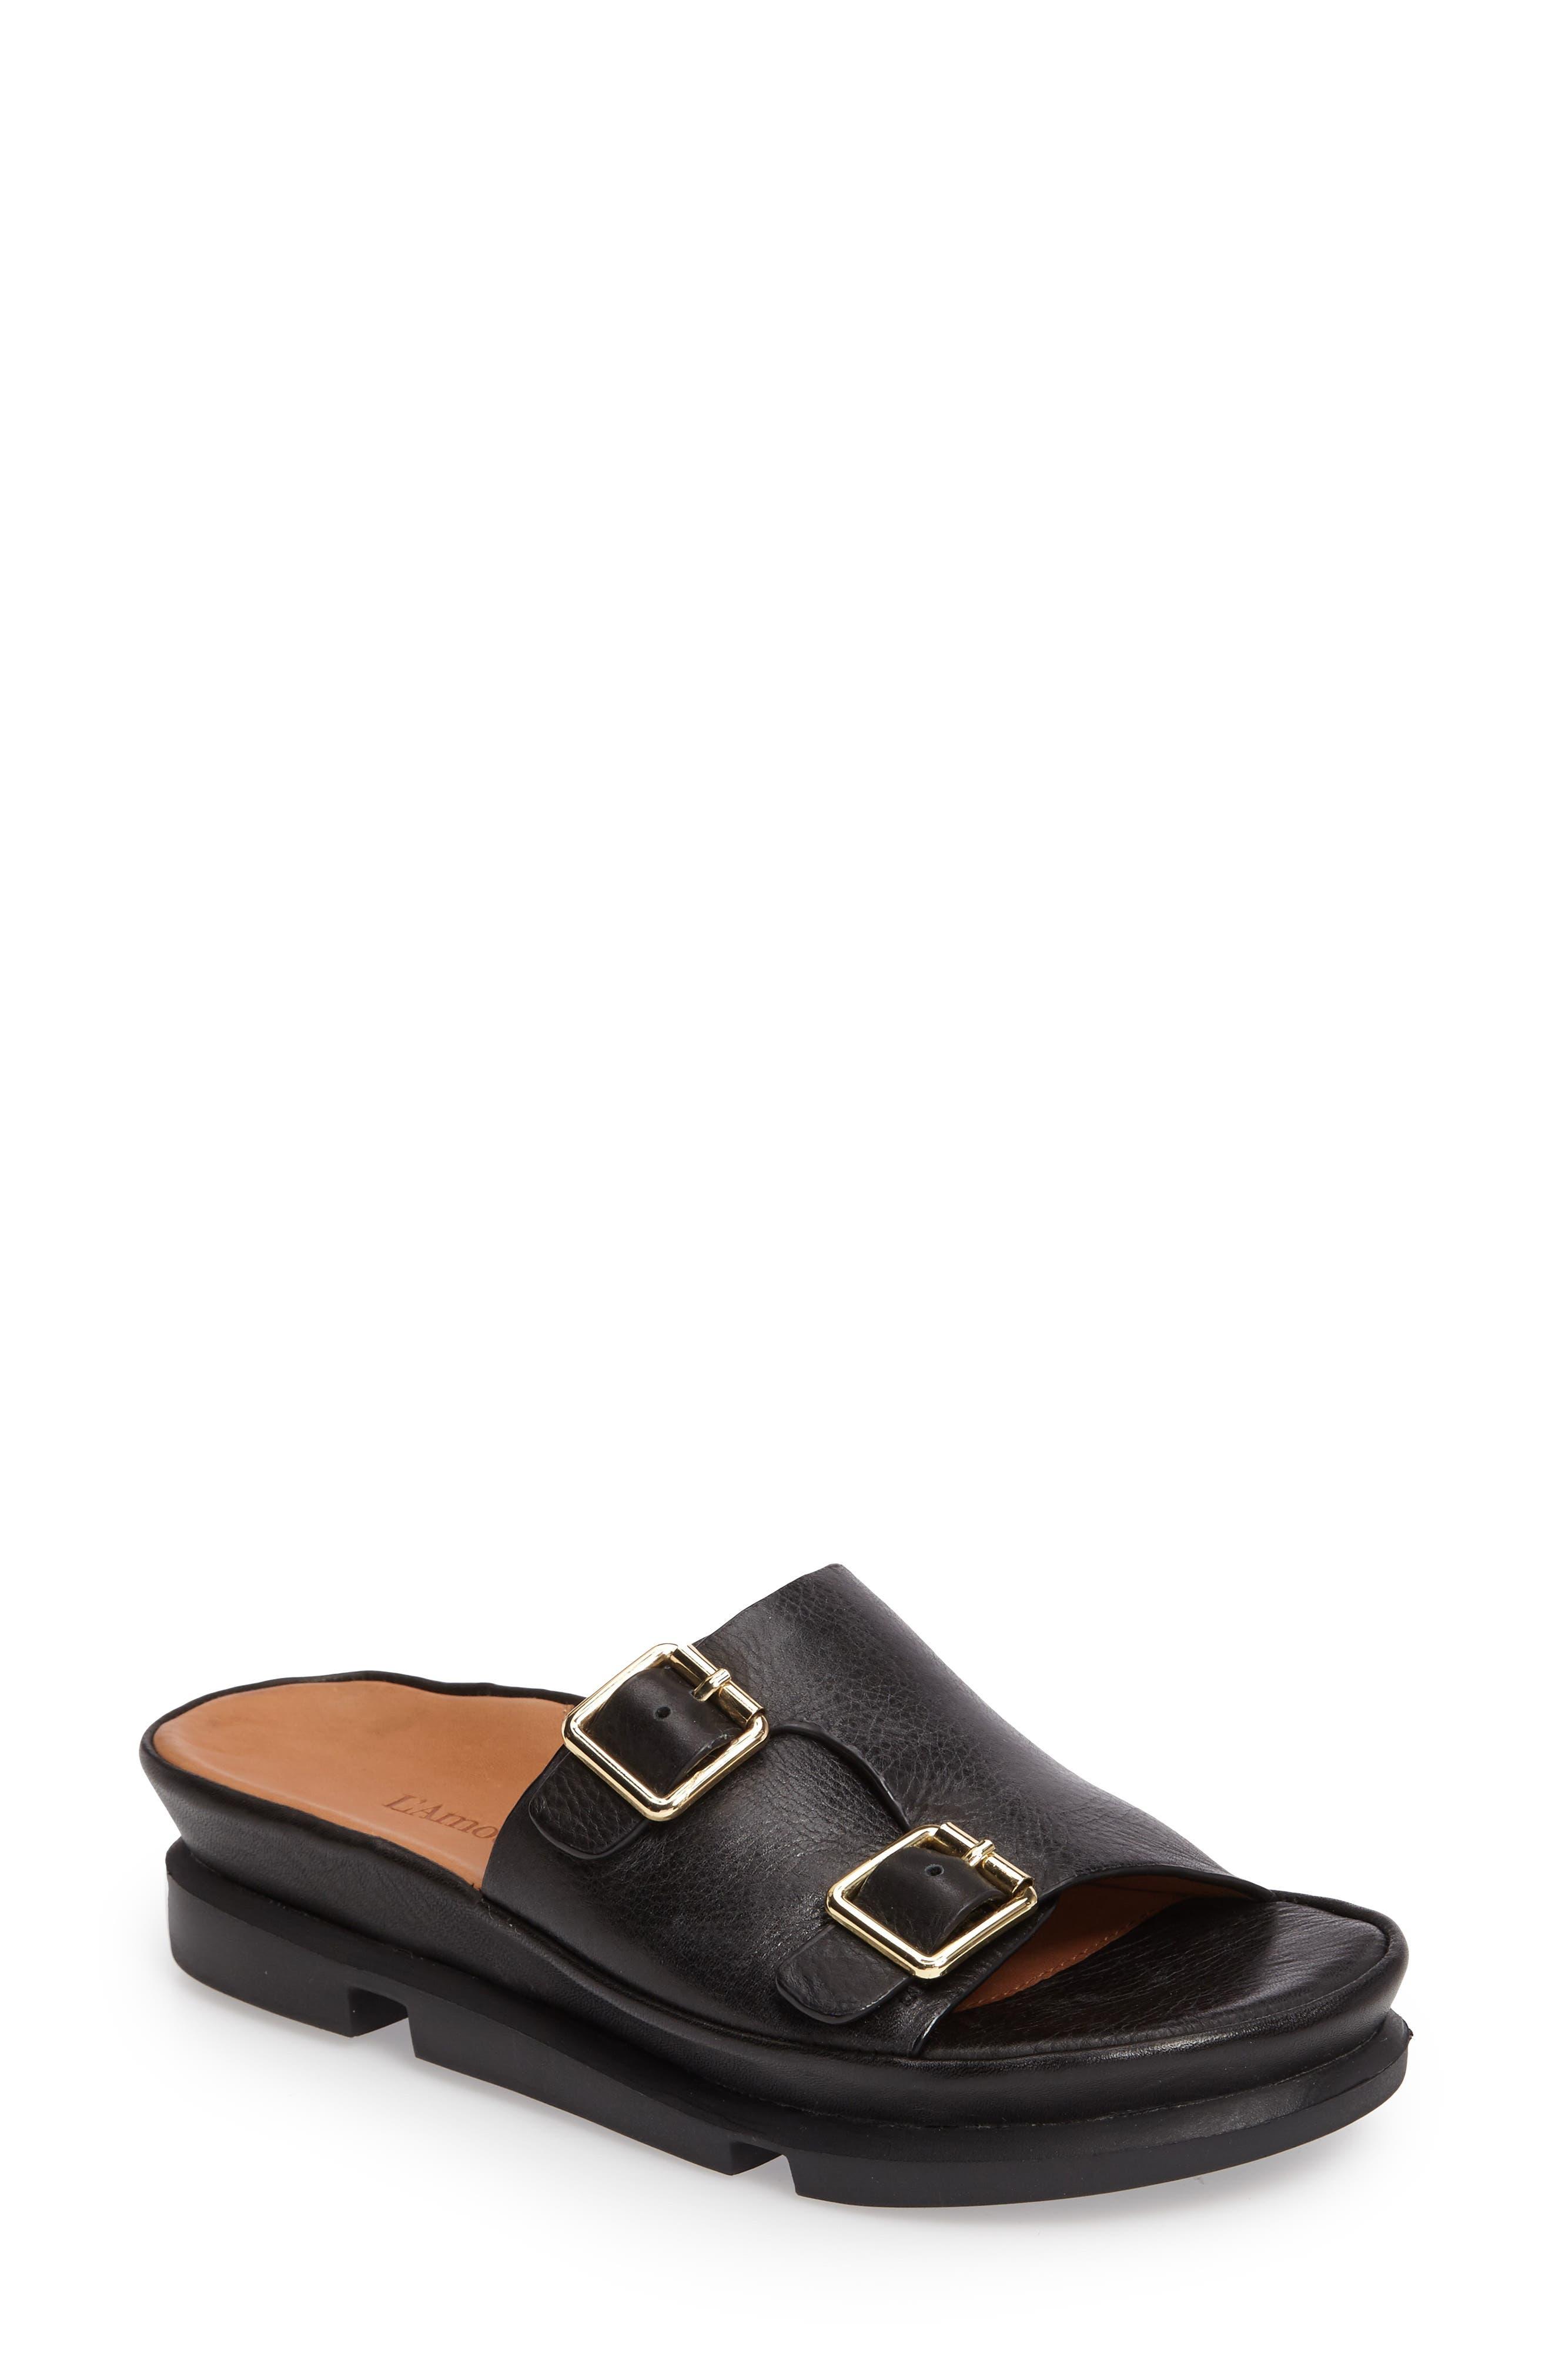 L'AMOUR DES PIEDS Viareggio Slide Sandal, Main, color, BLACK LEATHER